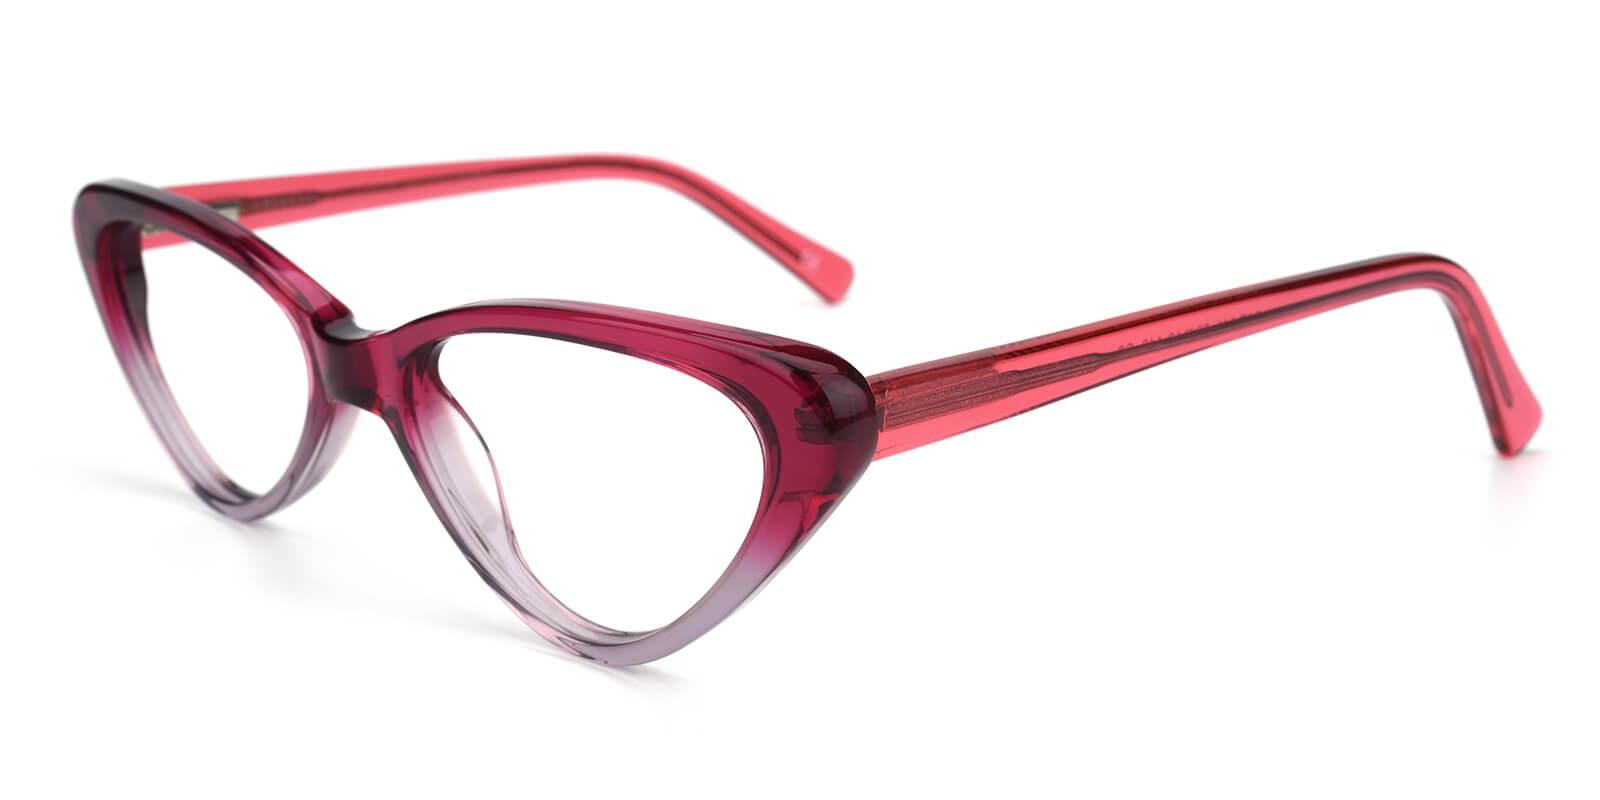 Catalin-Purple-Cat-Acetate-Eyeglasses-additional1